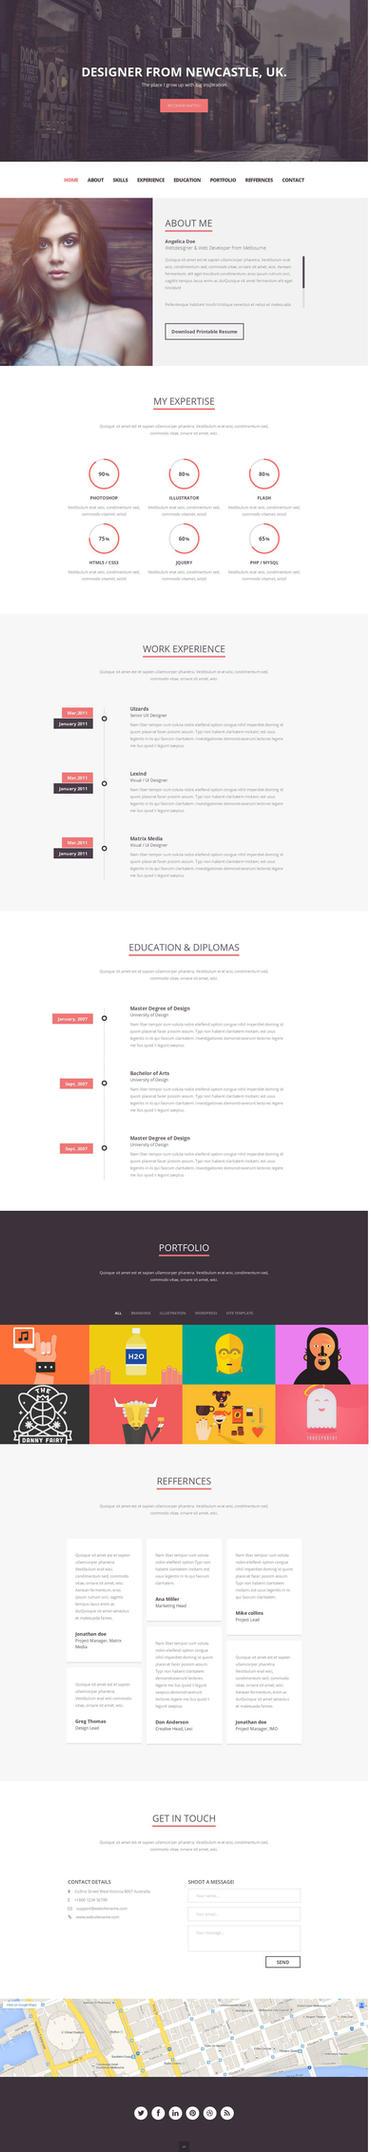 Folix Responsive Resume, Personal Portfolio Temp by psdblast